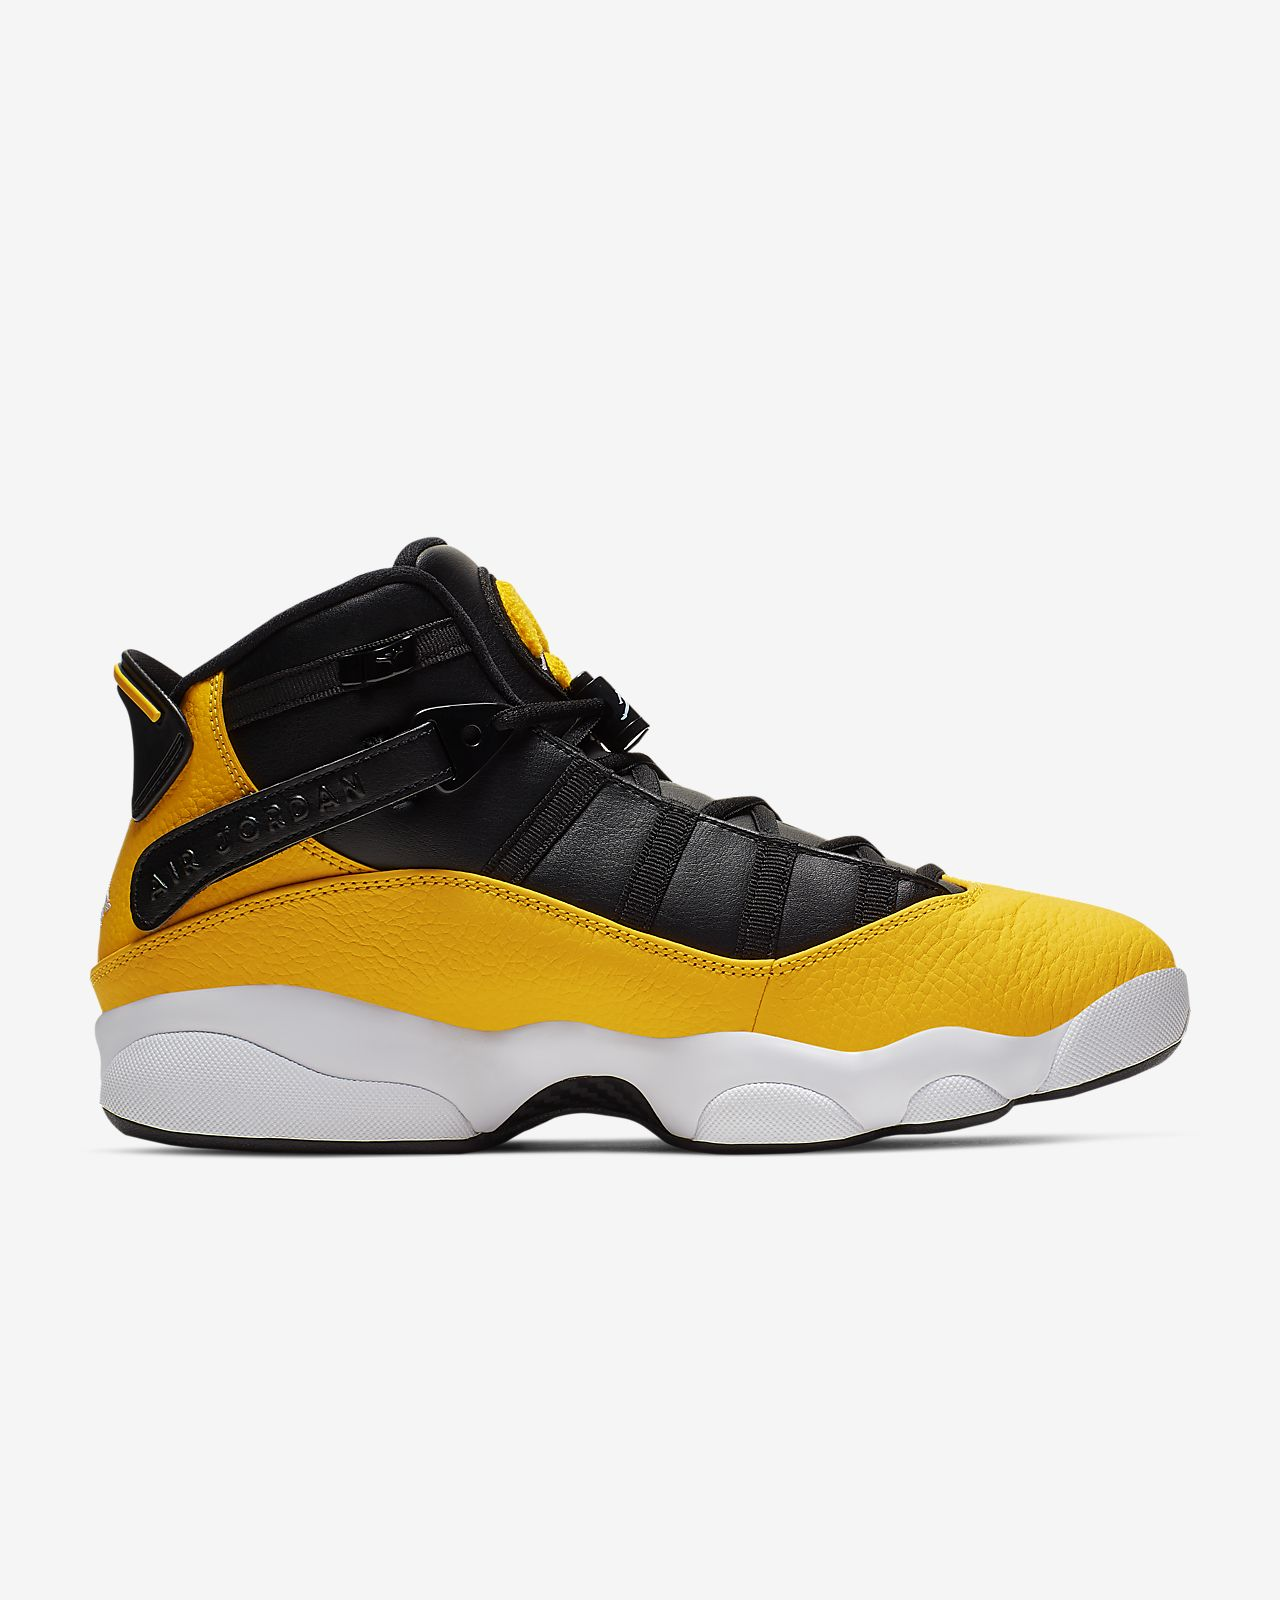 outlet store f3432 0d70b ... Chaussure Jordan 6 Rings pour Homme